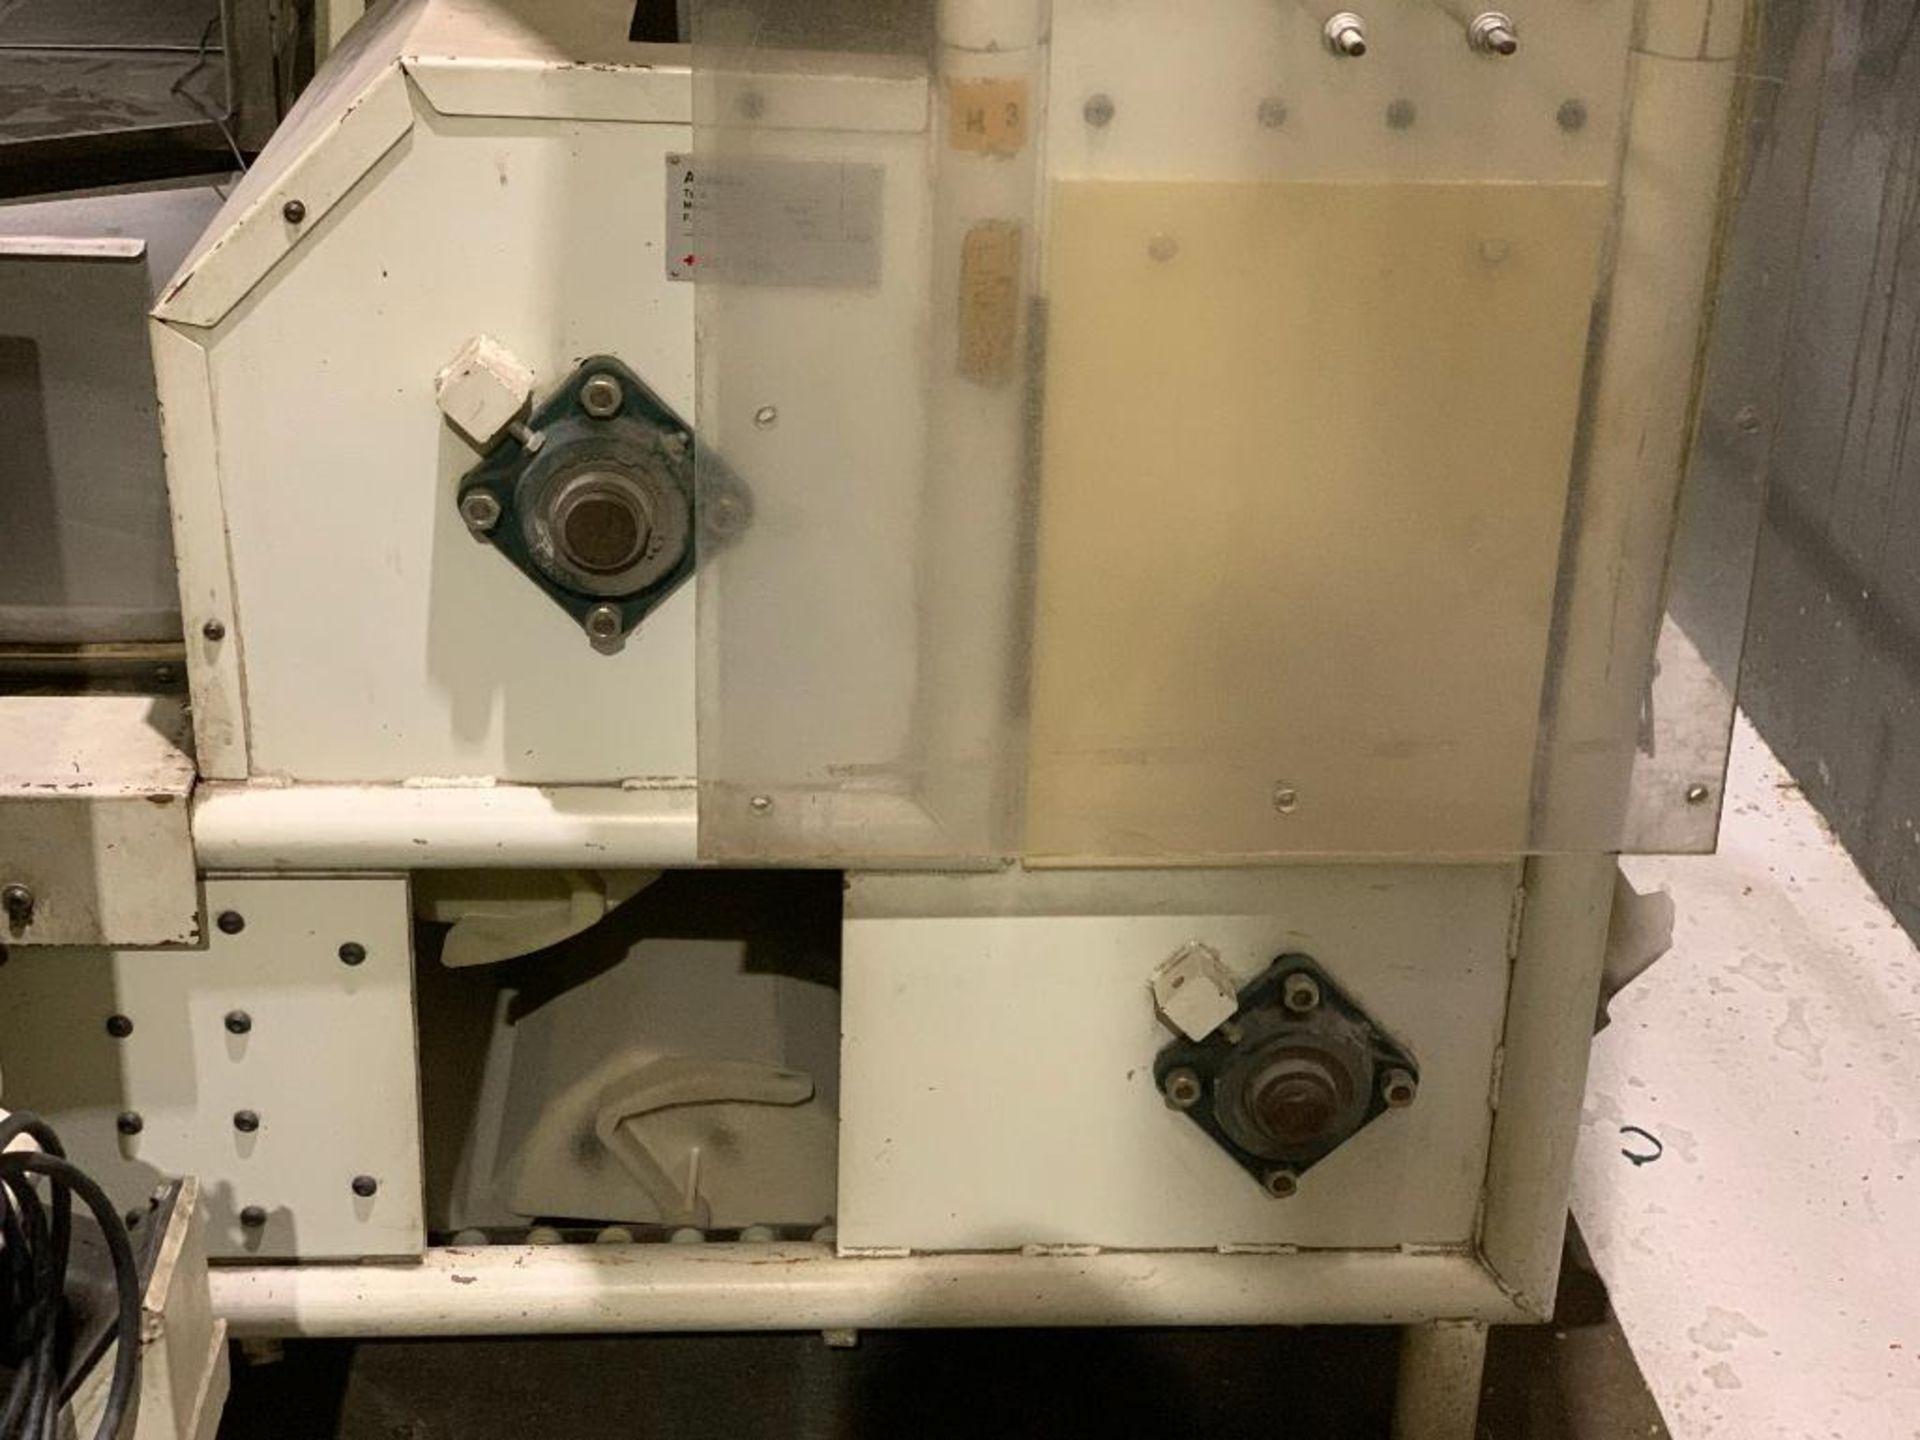 1990 Aseeco horizontal bucket elevator, model ALH-0-24 - Image 3 of 16